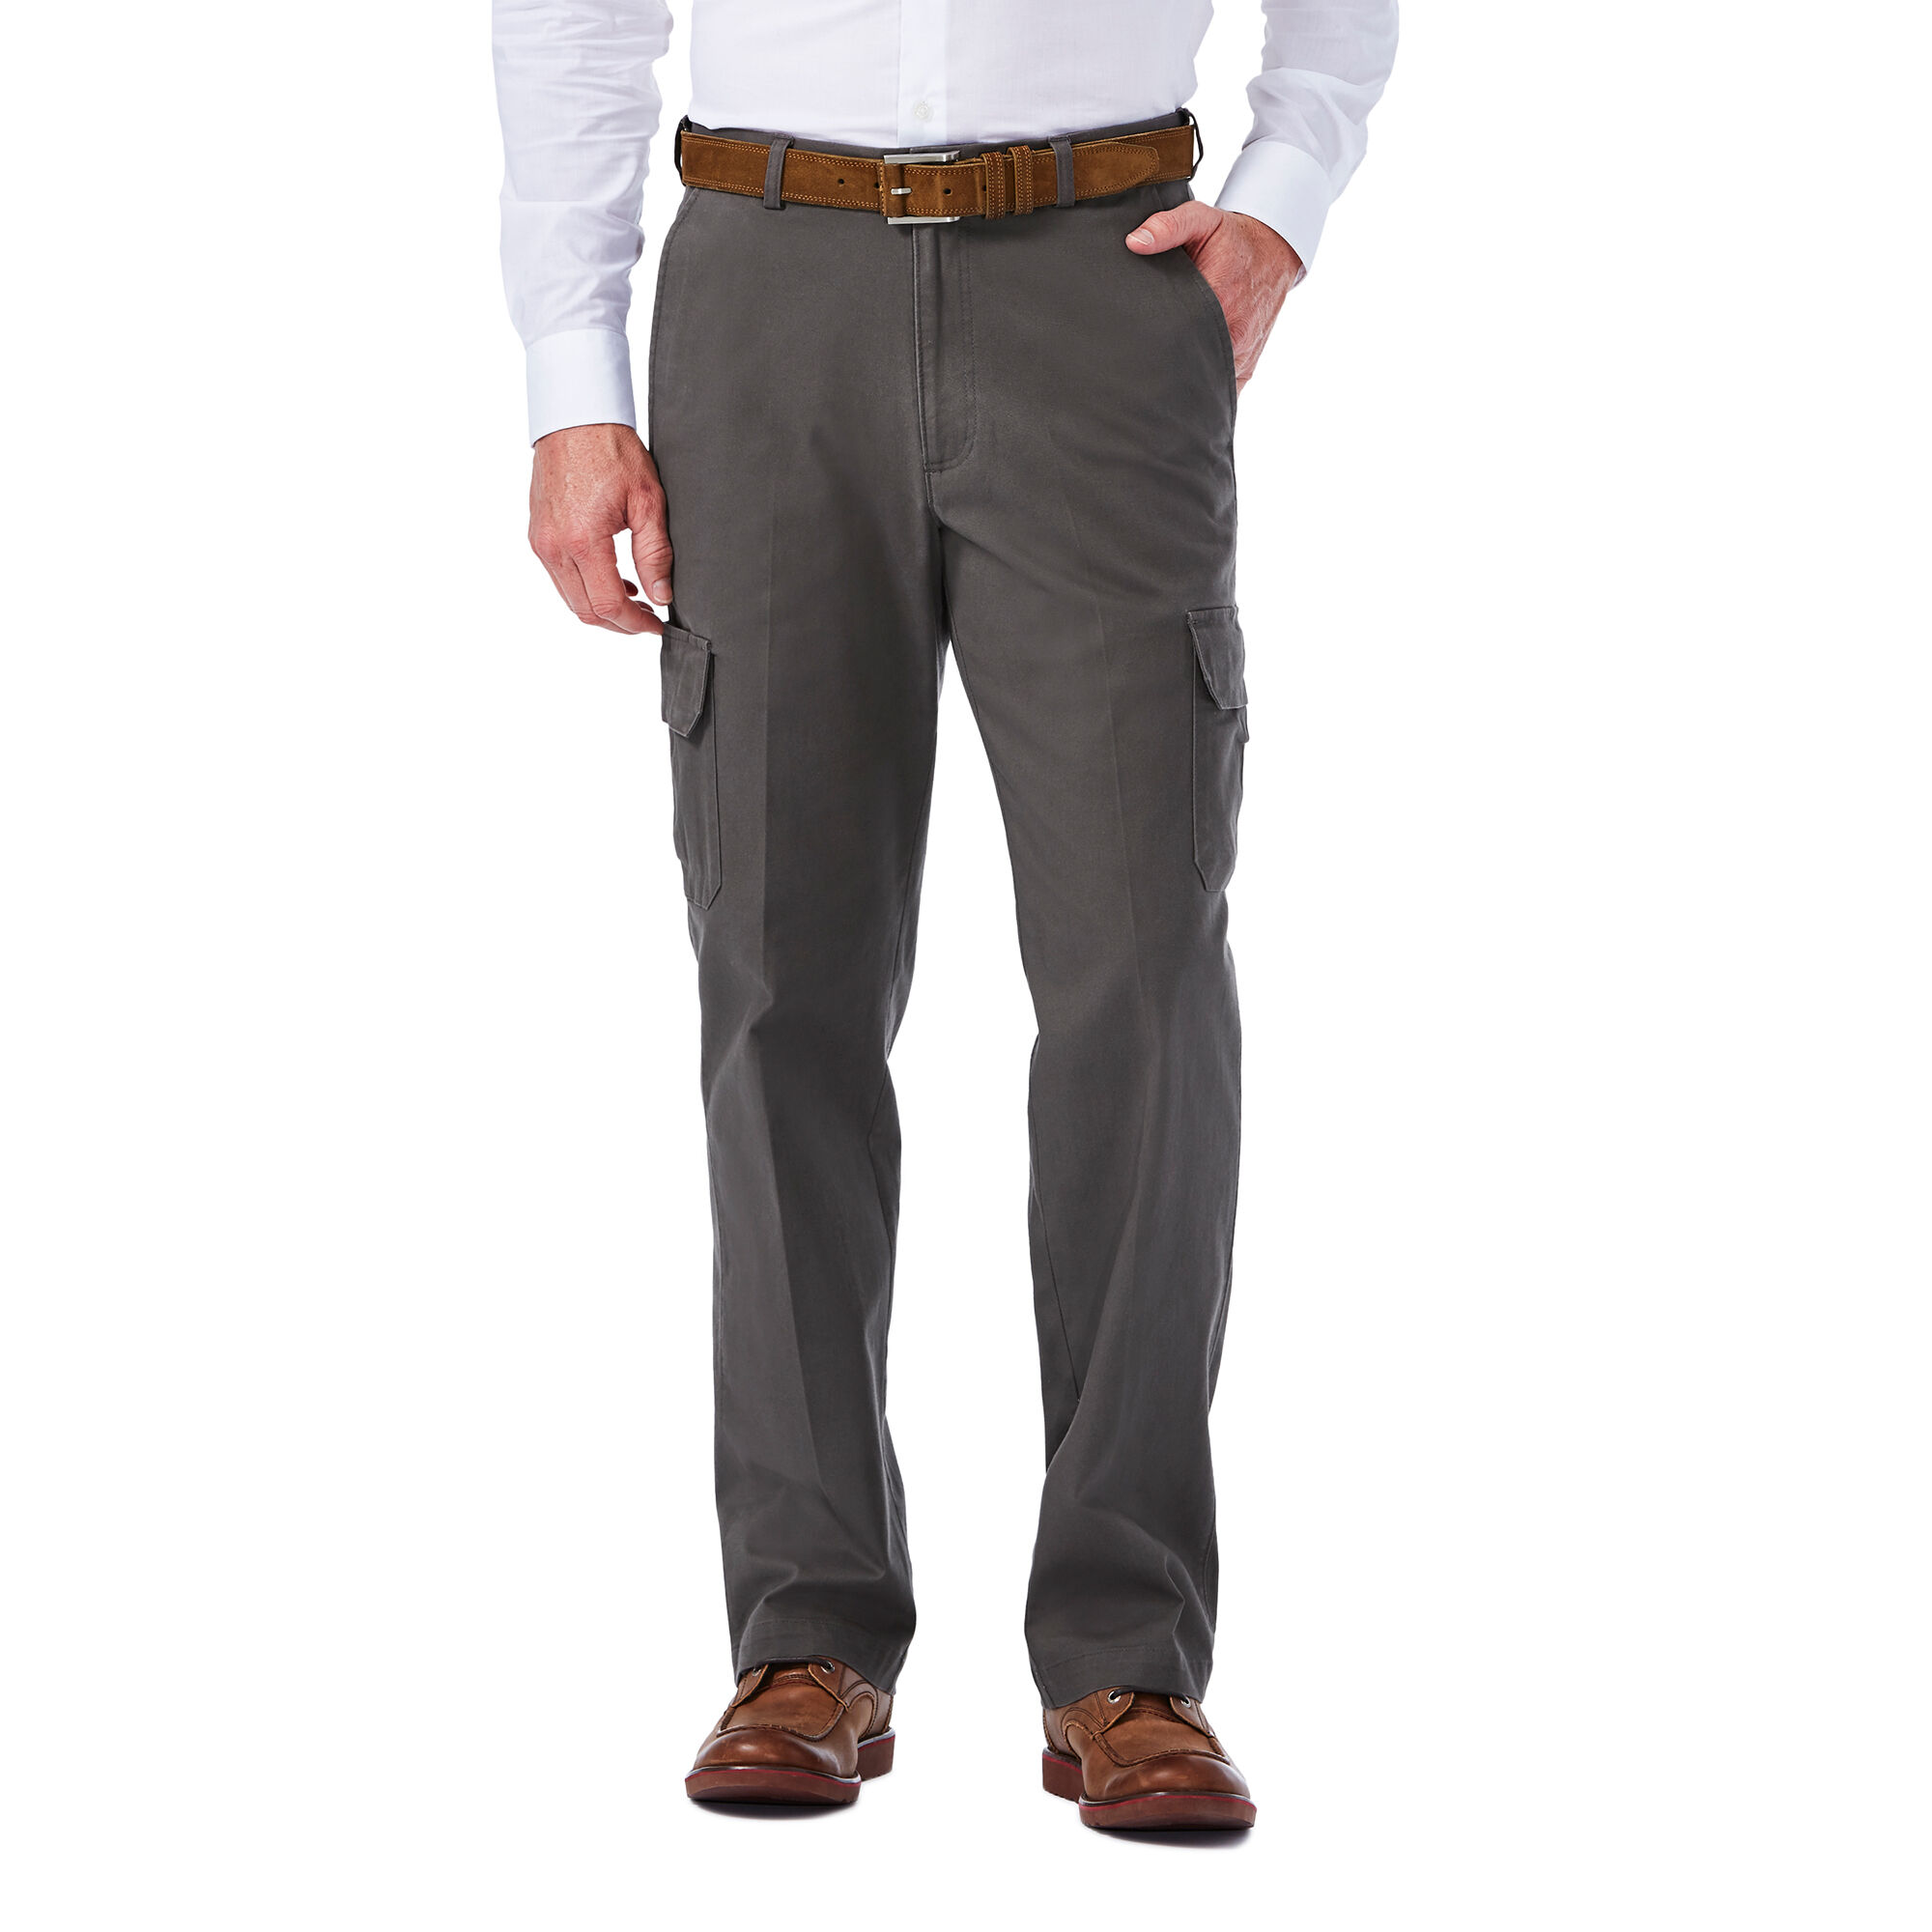 6d4b1143f3ccc Stretch Comfort Cargo Pant